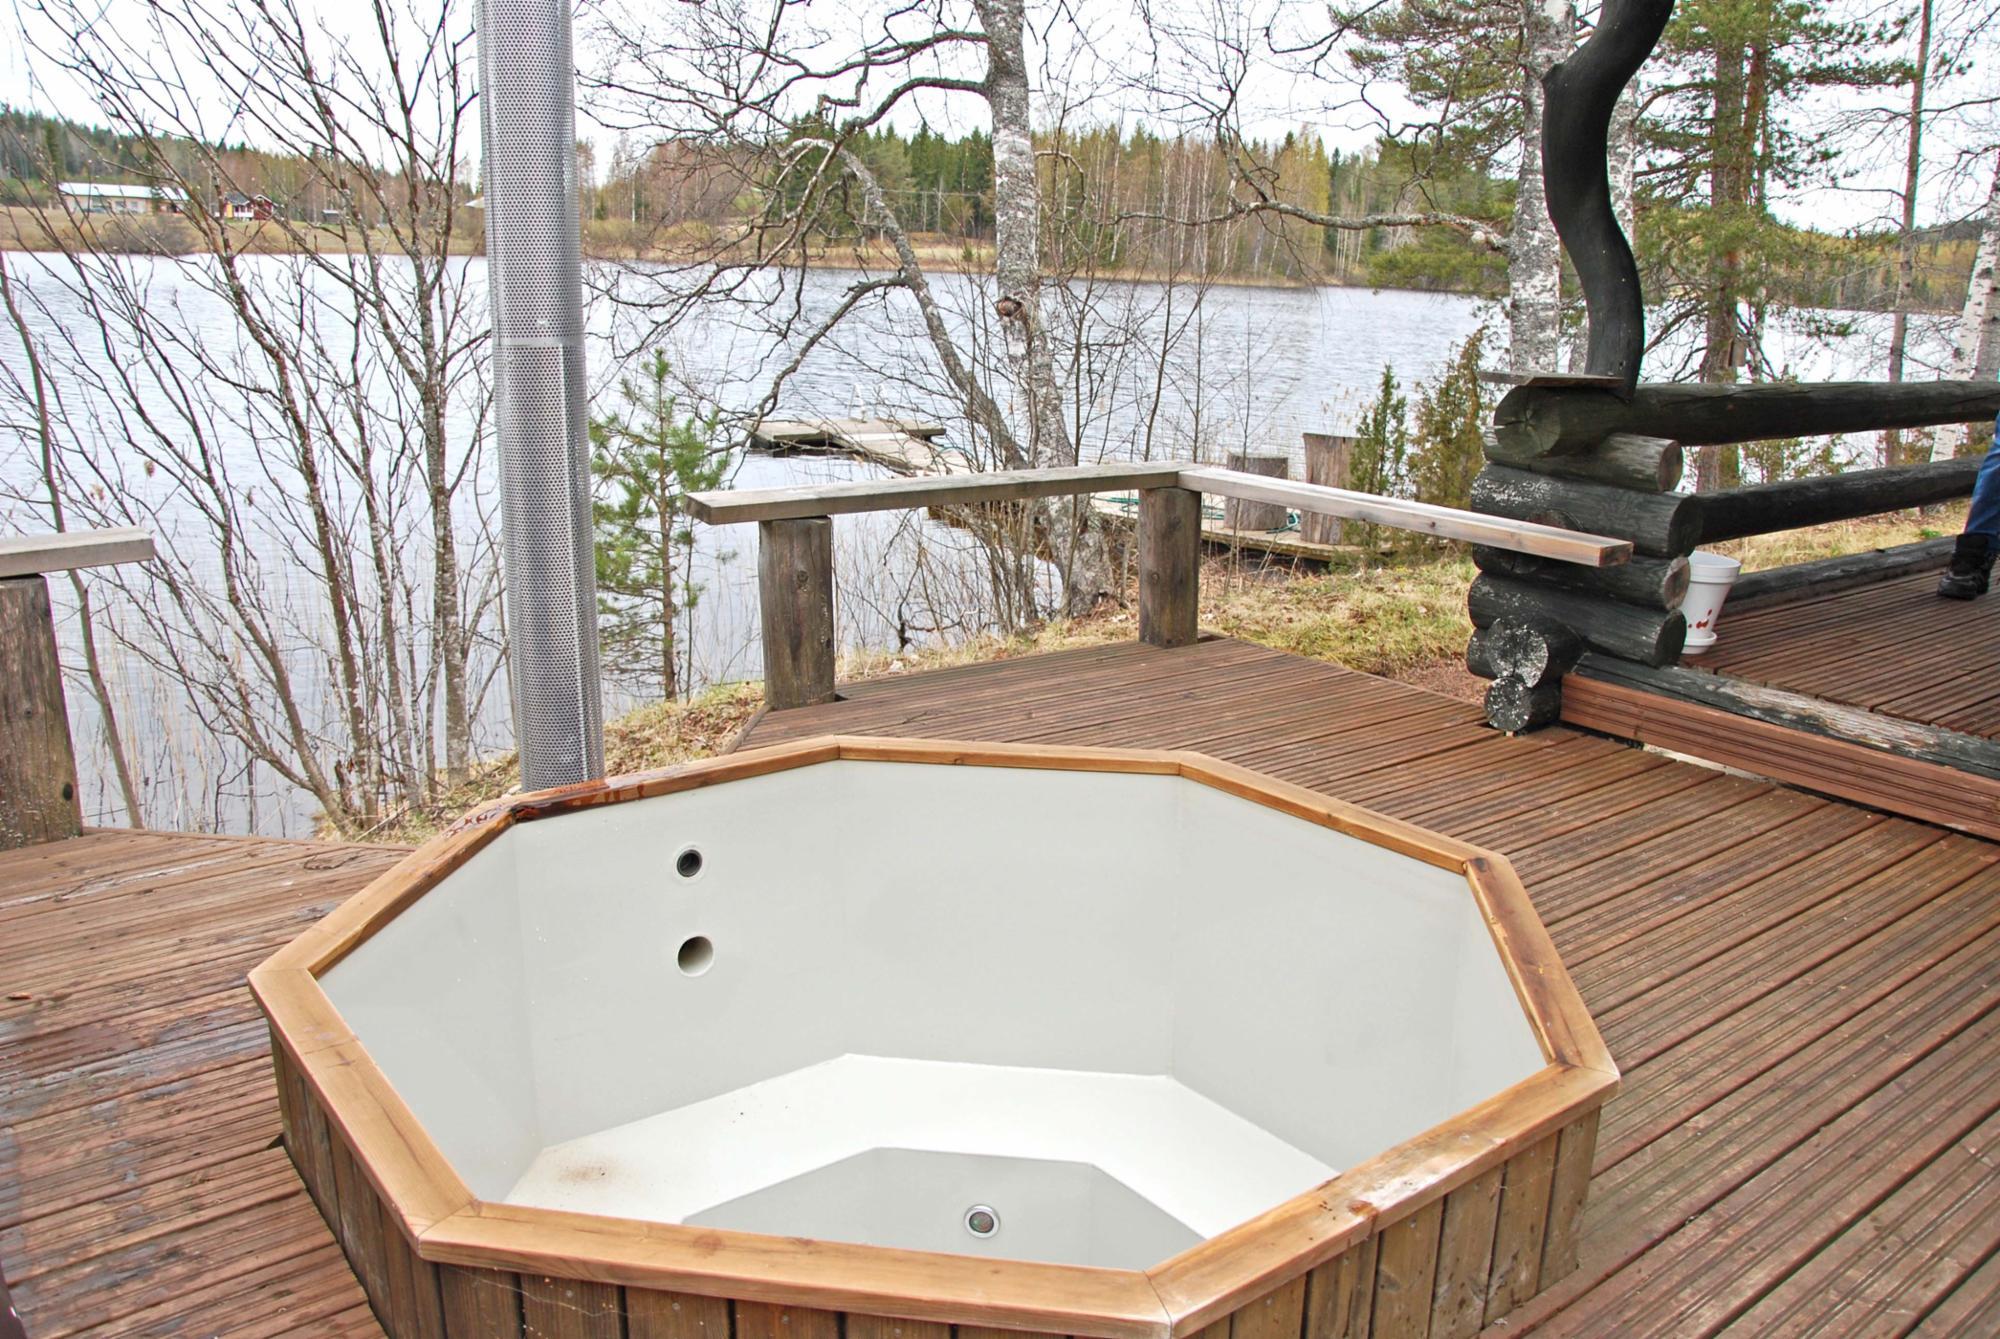 Bath barrel extra charge